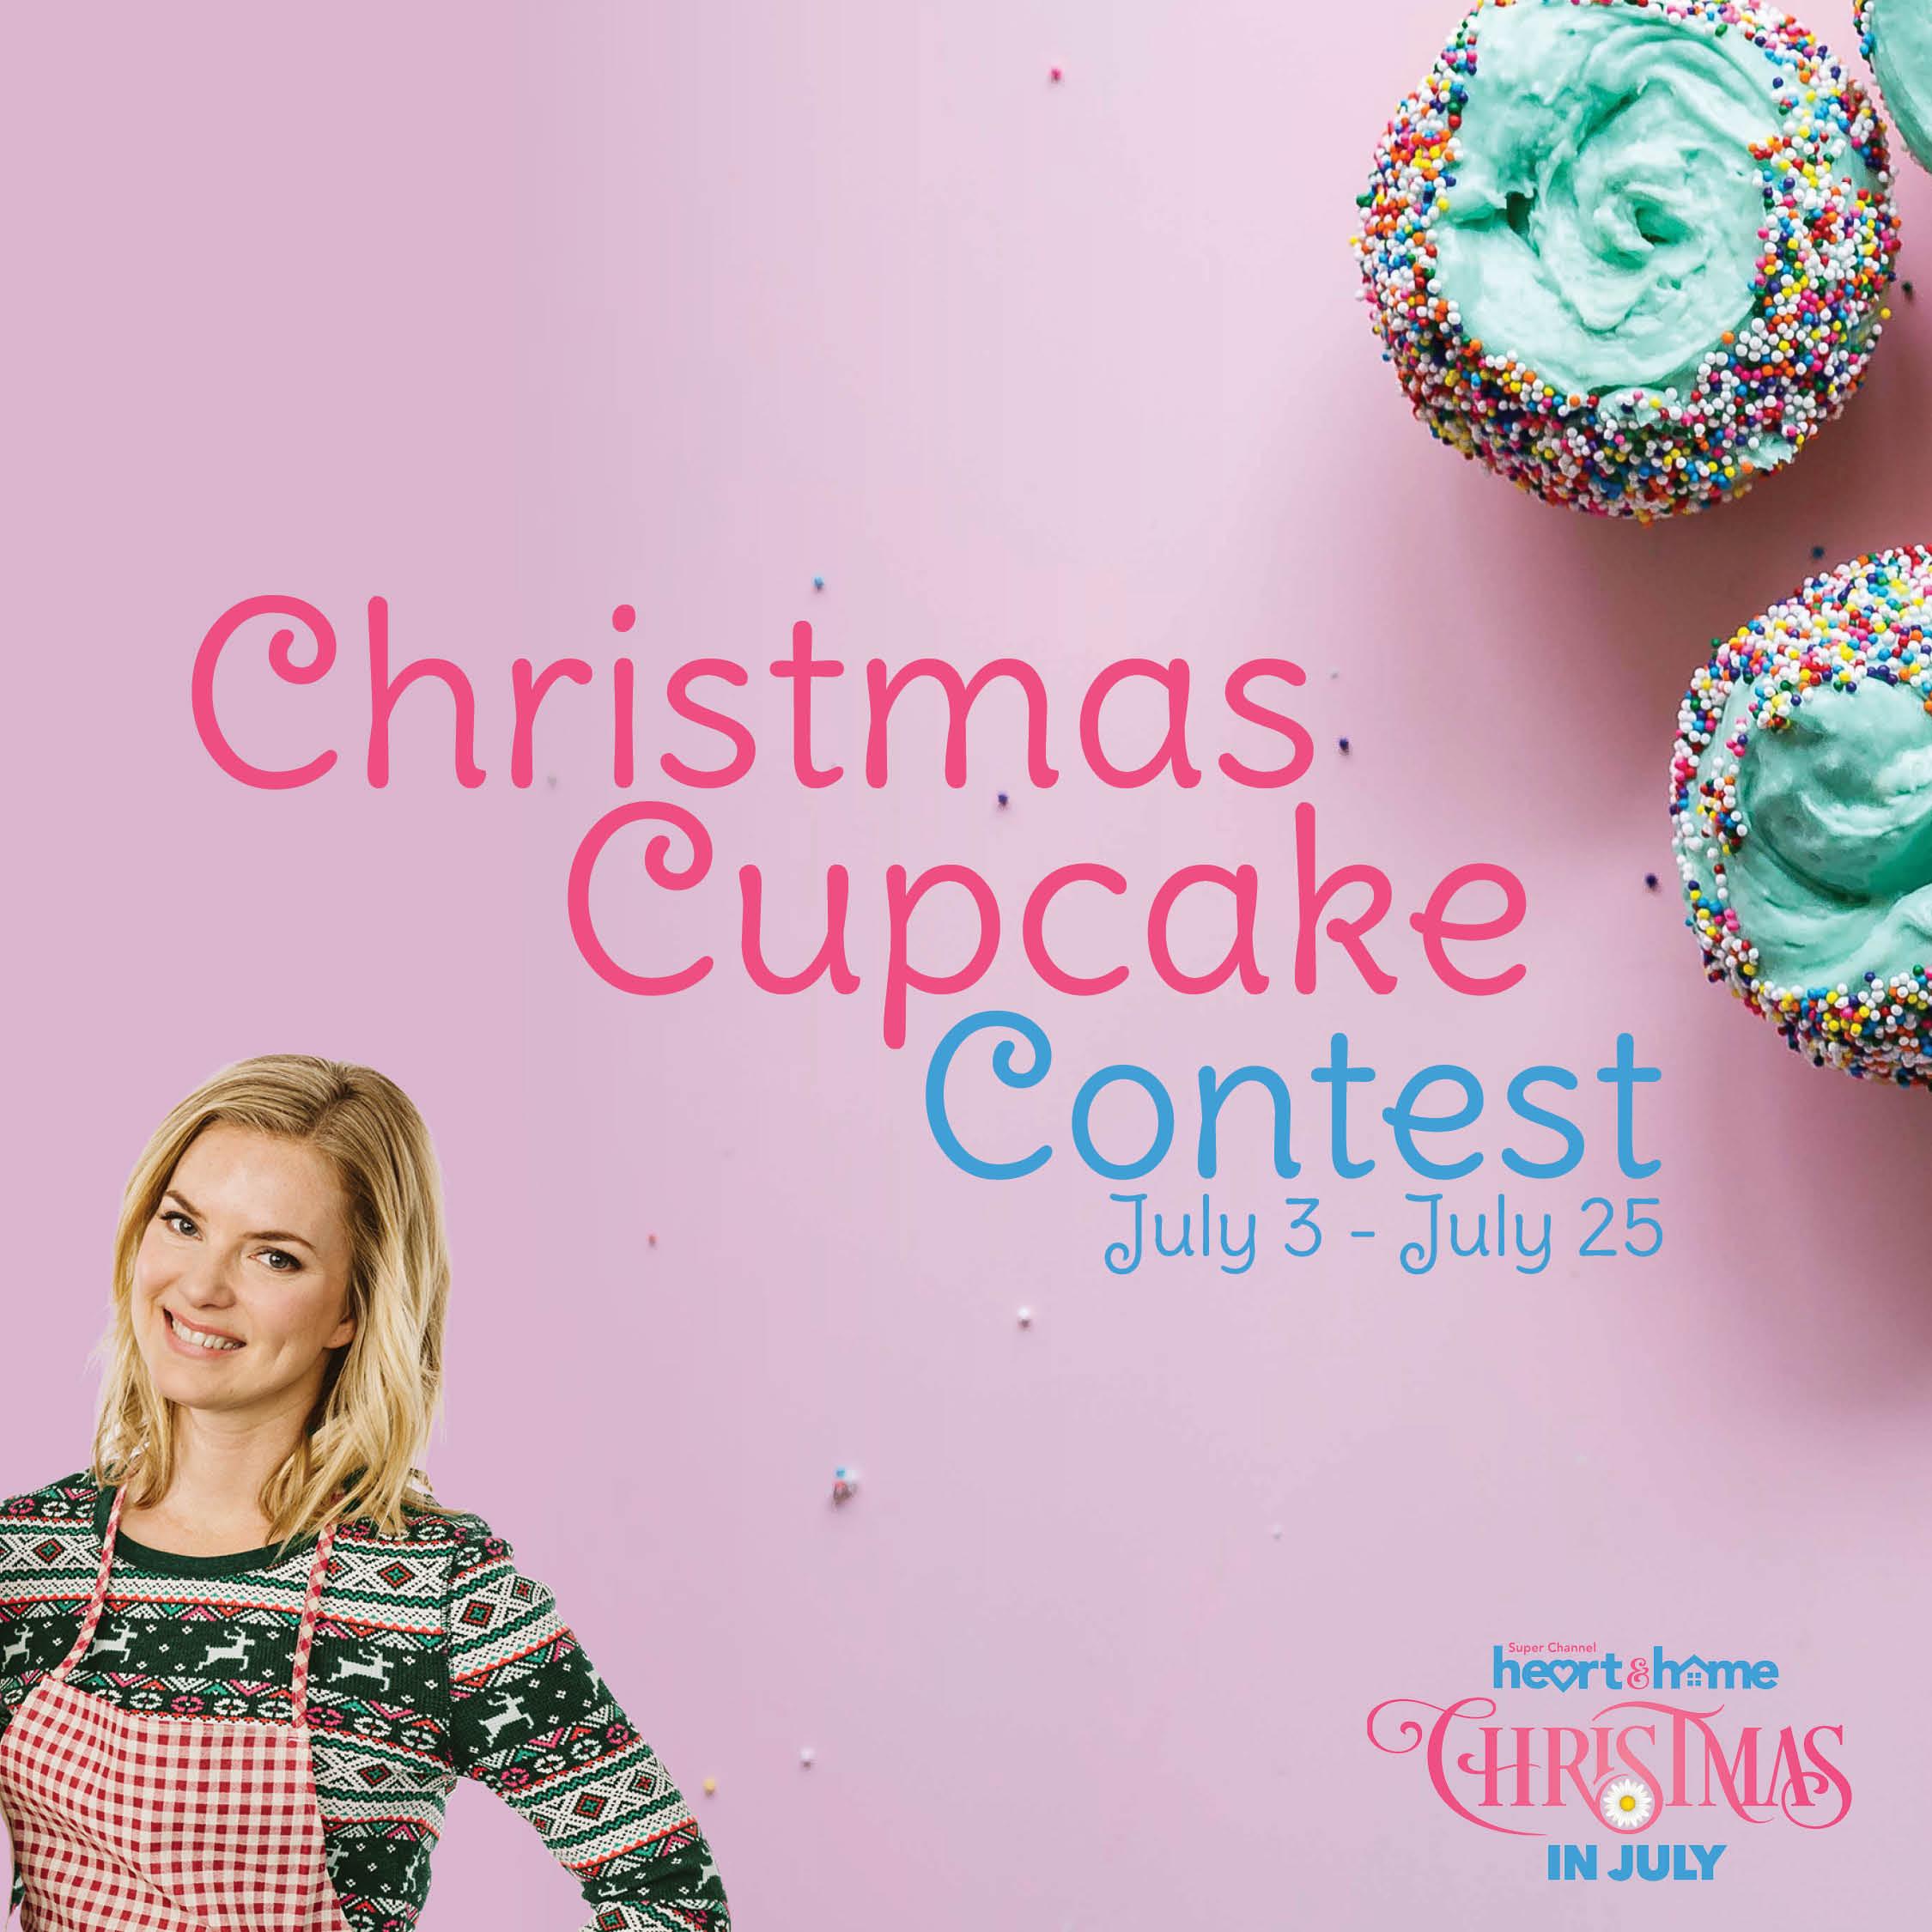 Christmas Cupcake Contest